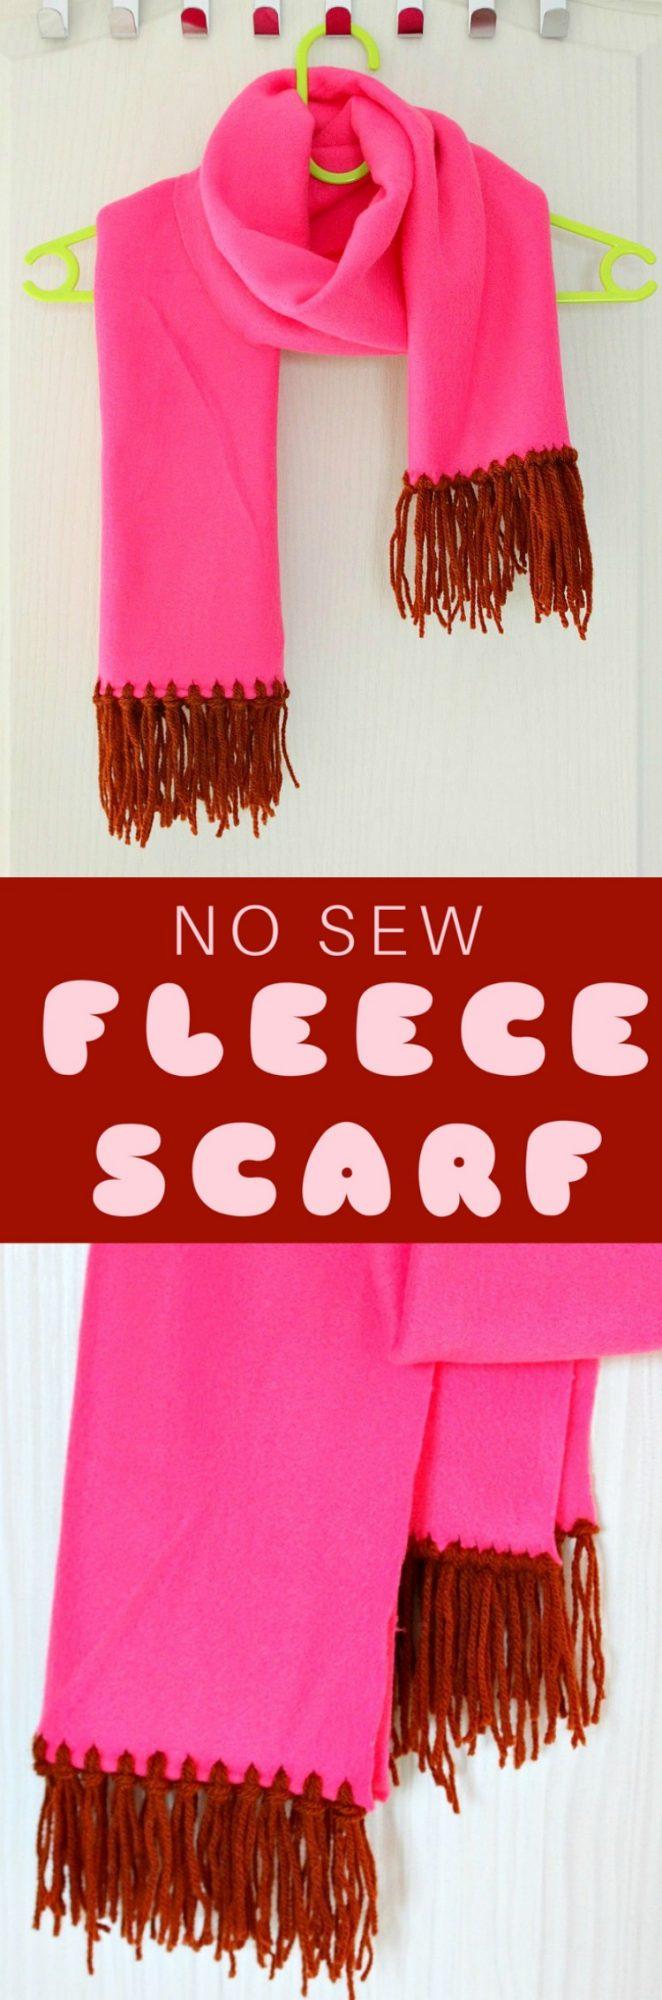 No sew fleece scarf tutorial